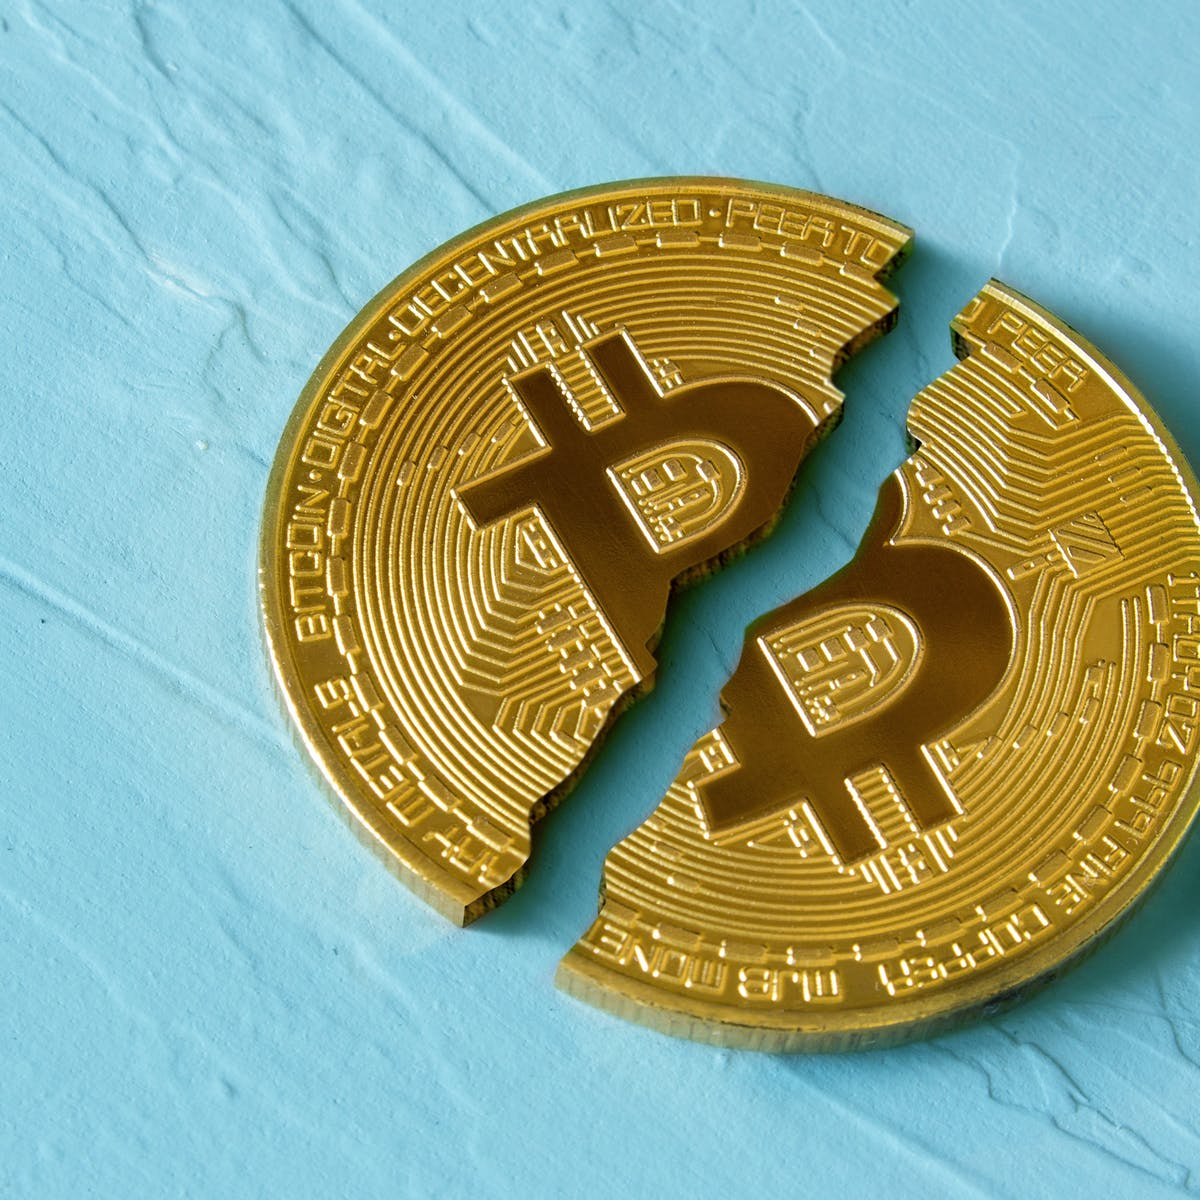 bitcoin one 0 3 btc į zar